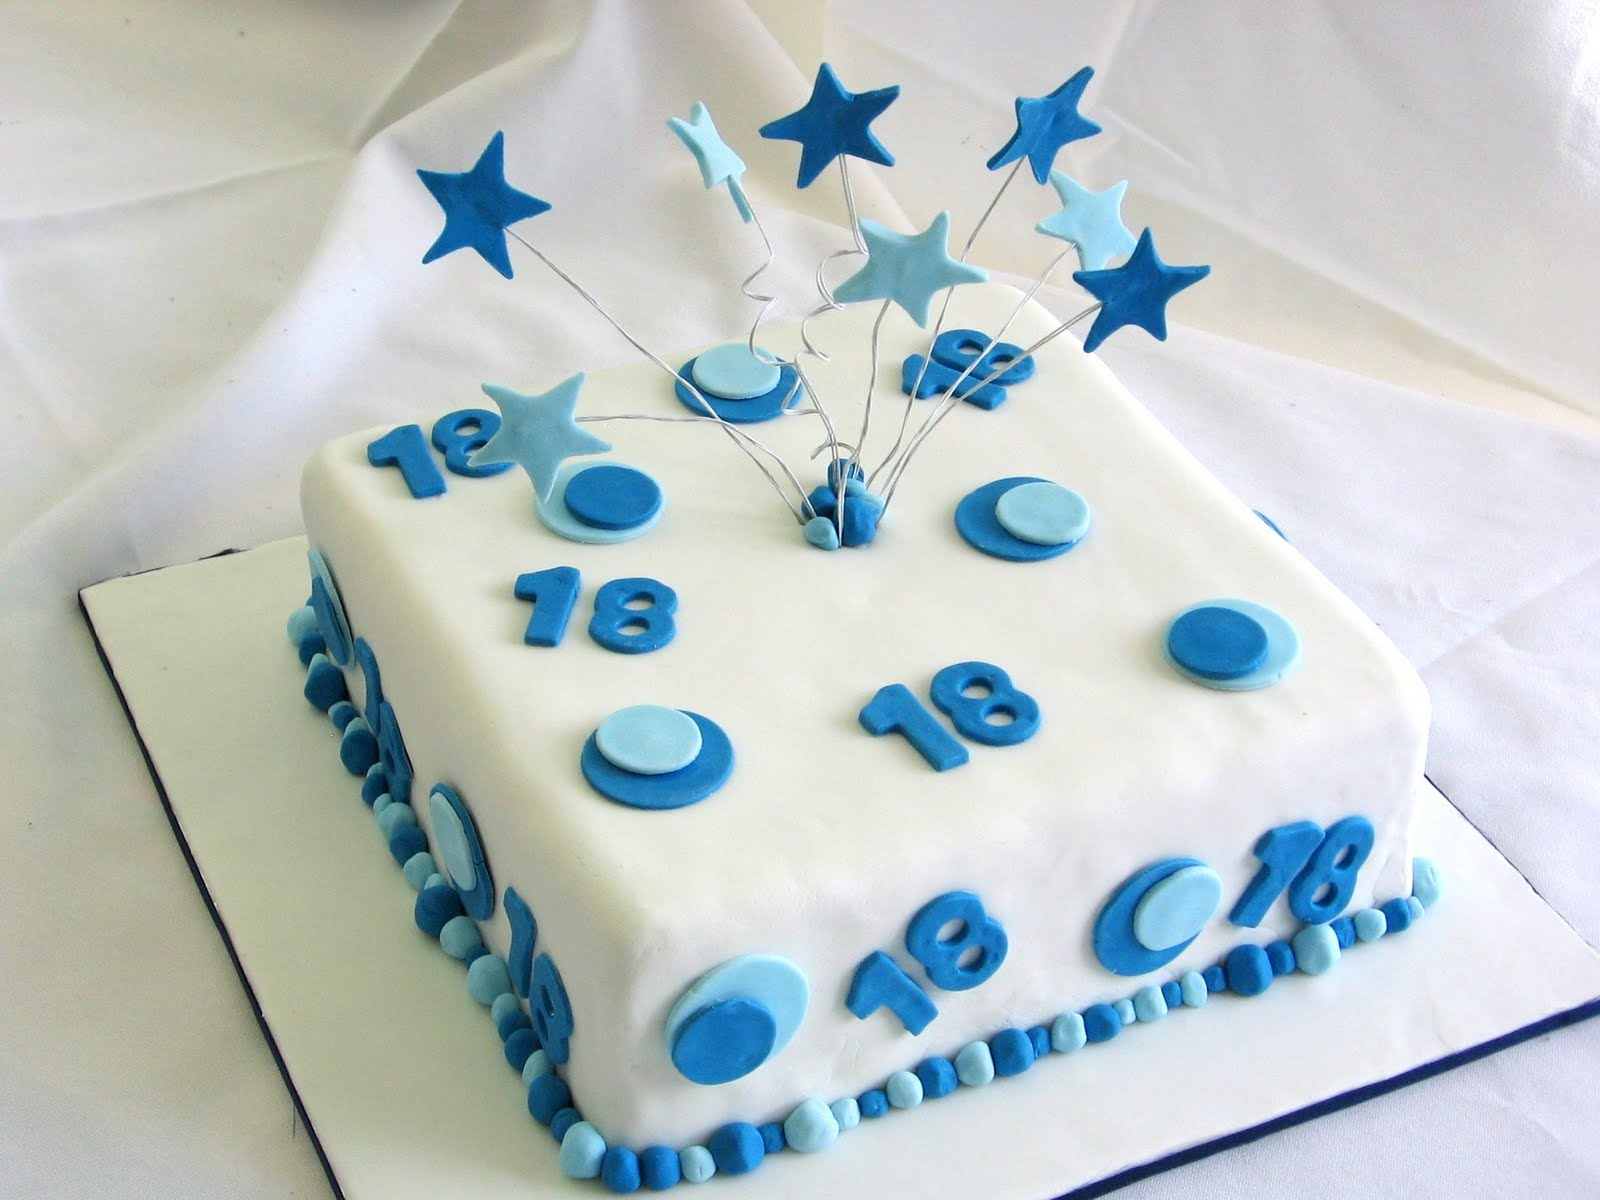 Rachel Warner Cakes 18th Cake